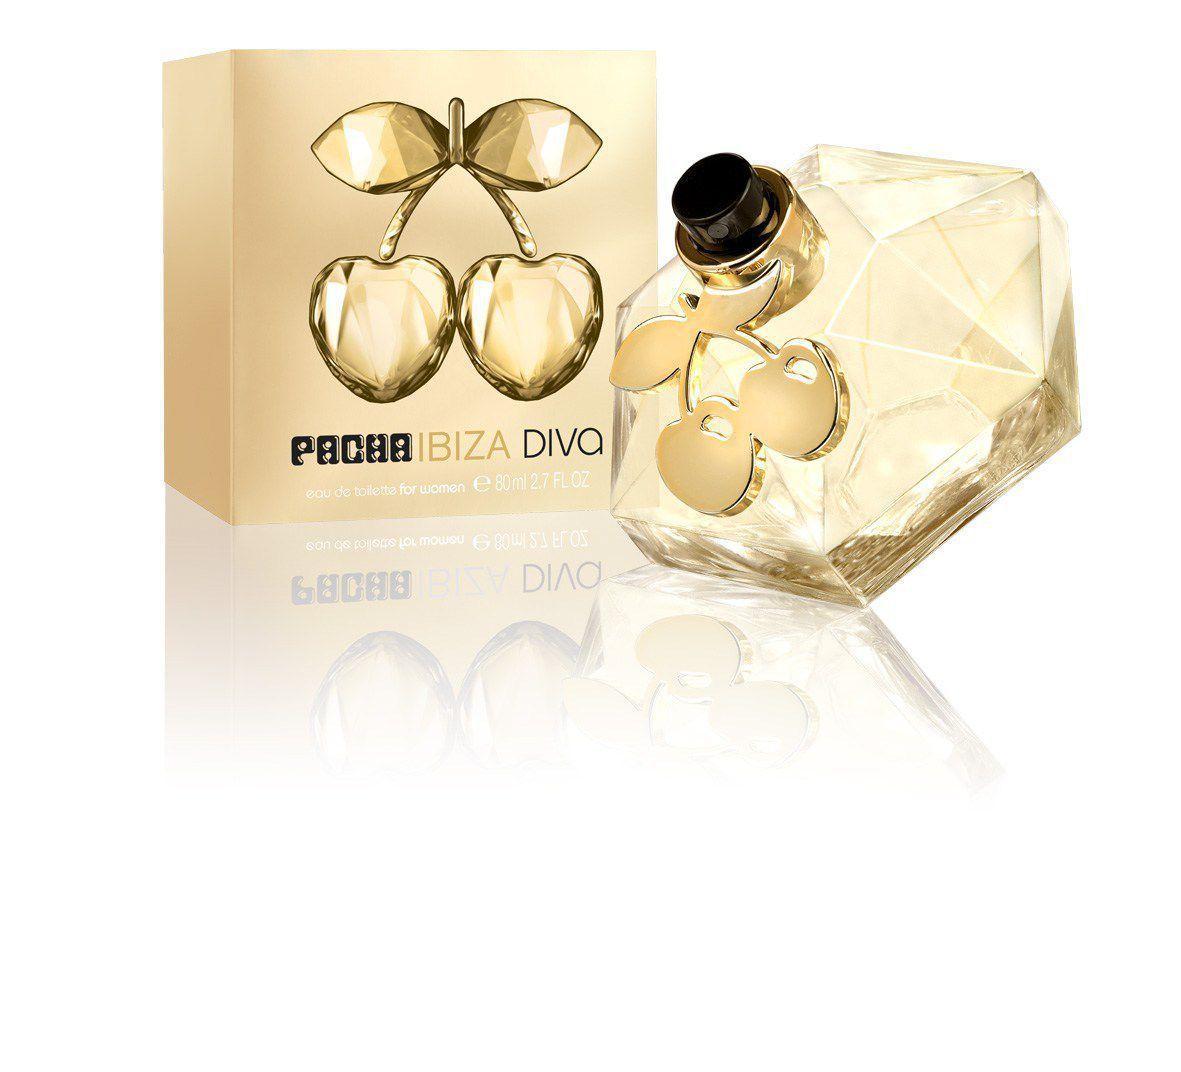 Queen Diva Pacha Ibiza - Perfume Feminino Eau de Toilette 30ml